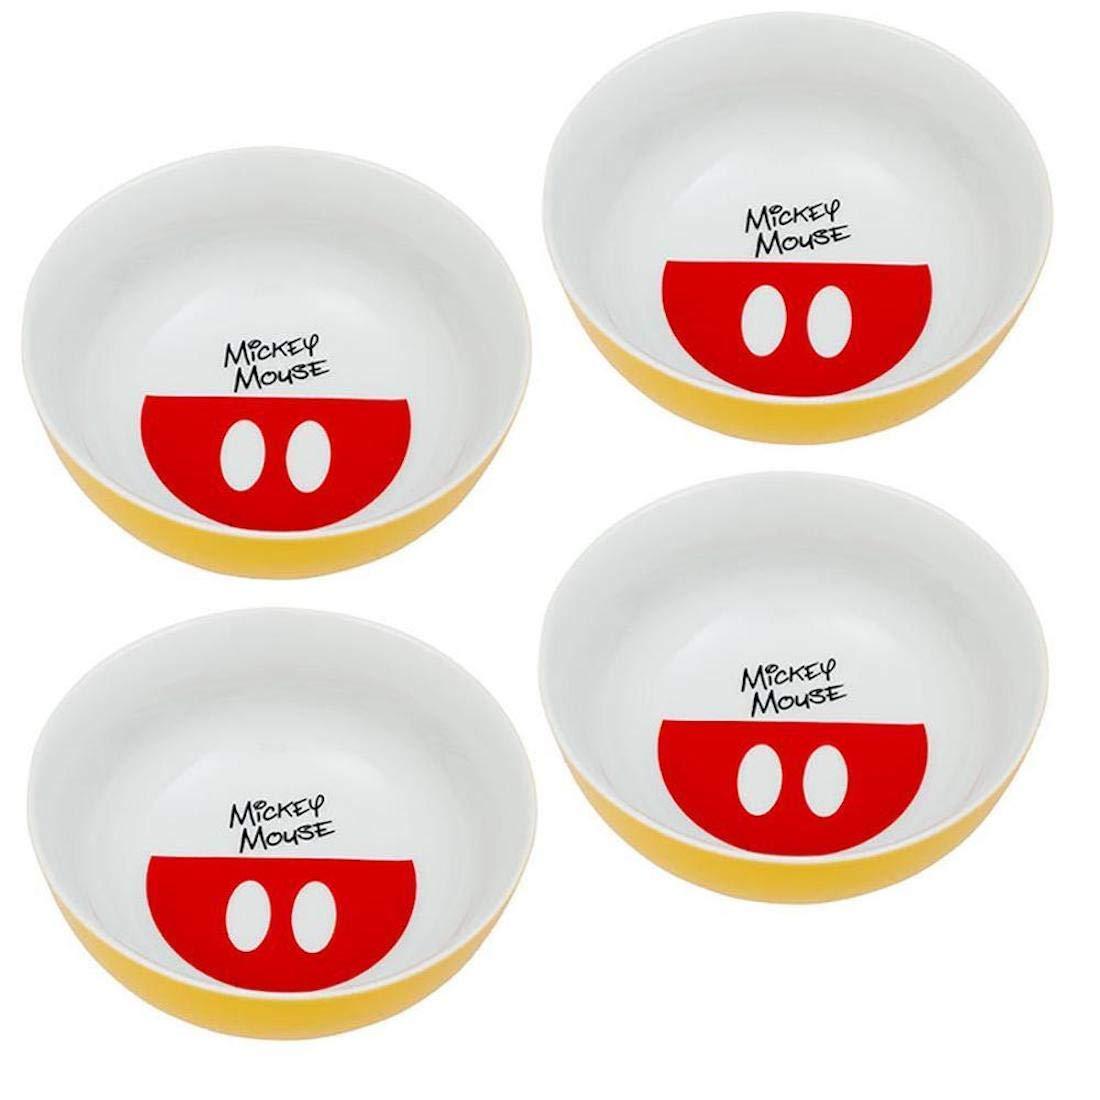 Vandor Disney Mickey Mouse 4 Piece 6 Inch Ceramic Bowl Set (89136)